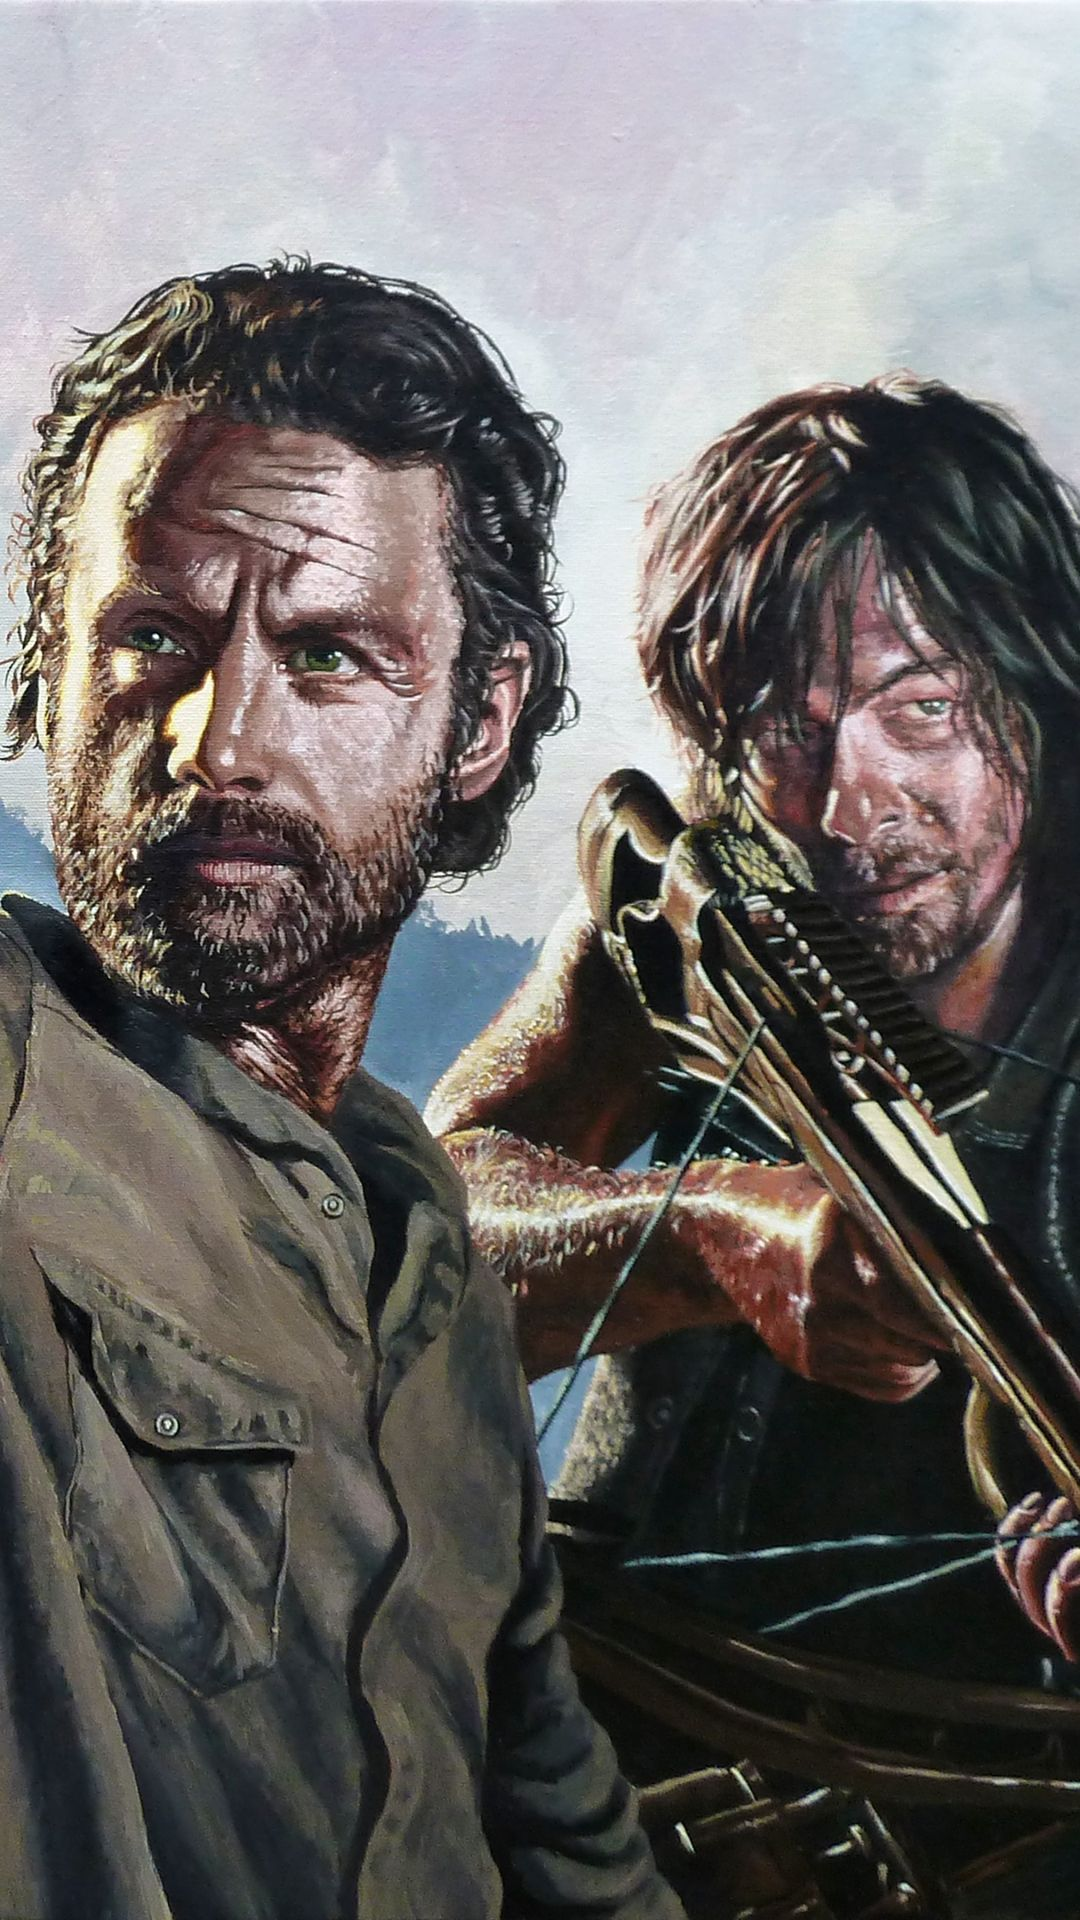 Pin by 🇩🇪LORDESS🇷🇺 on Walking dead Daryl dixon, Walking